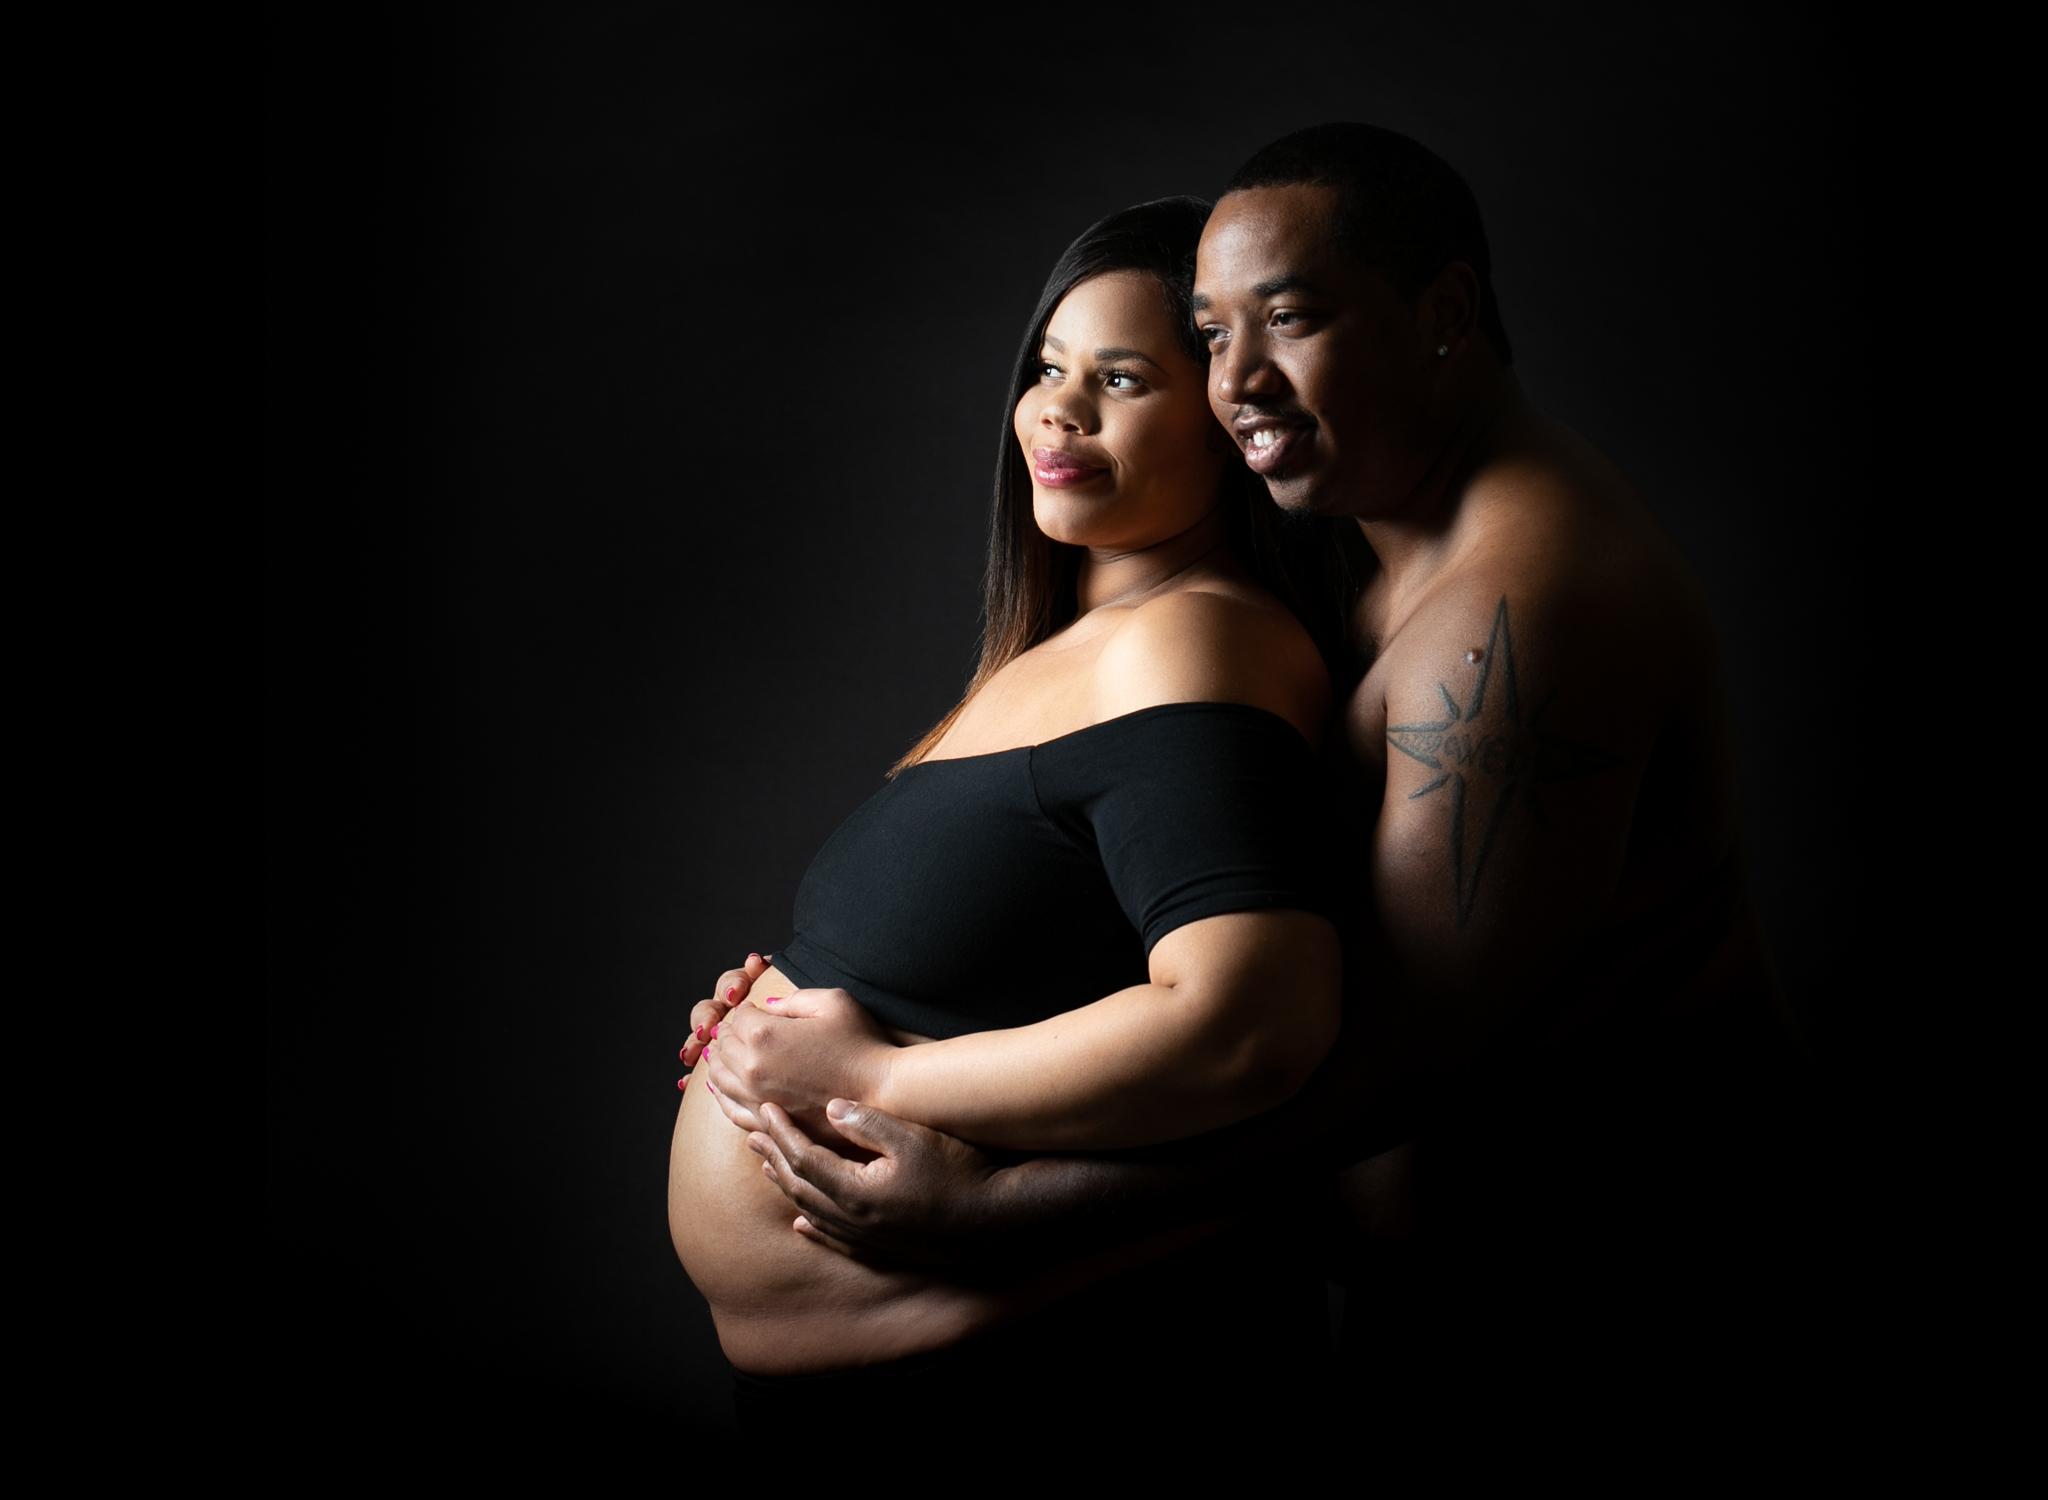 Pregnancy Portraits